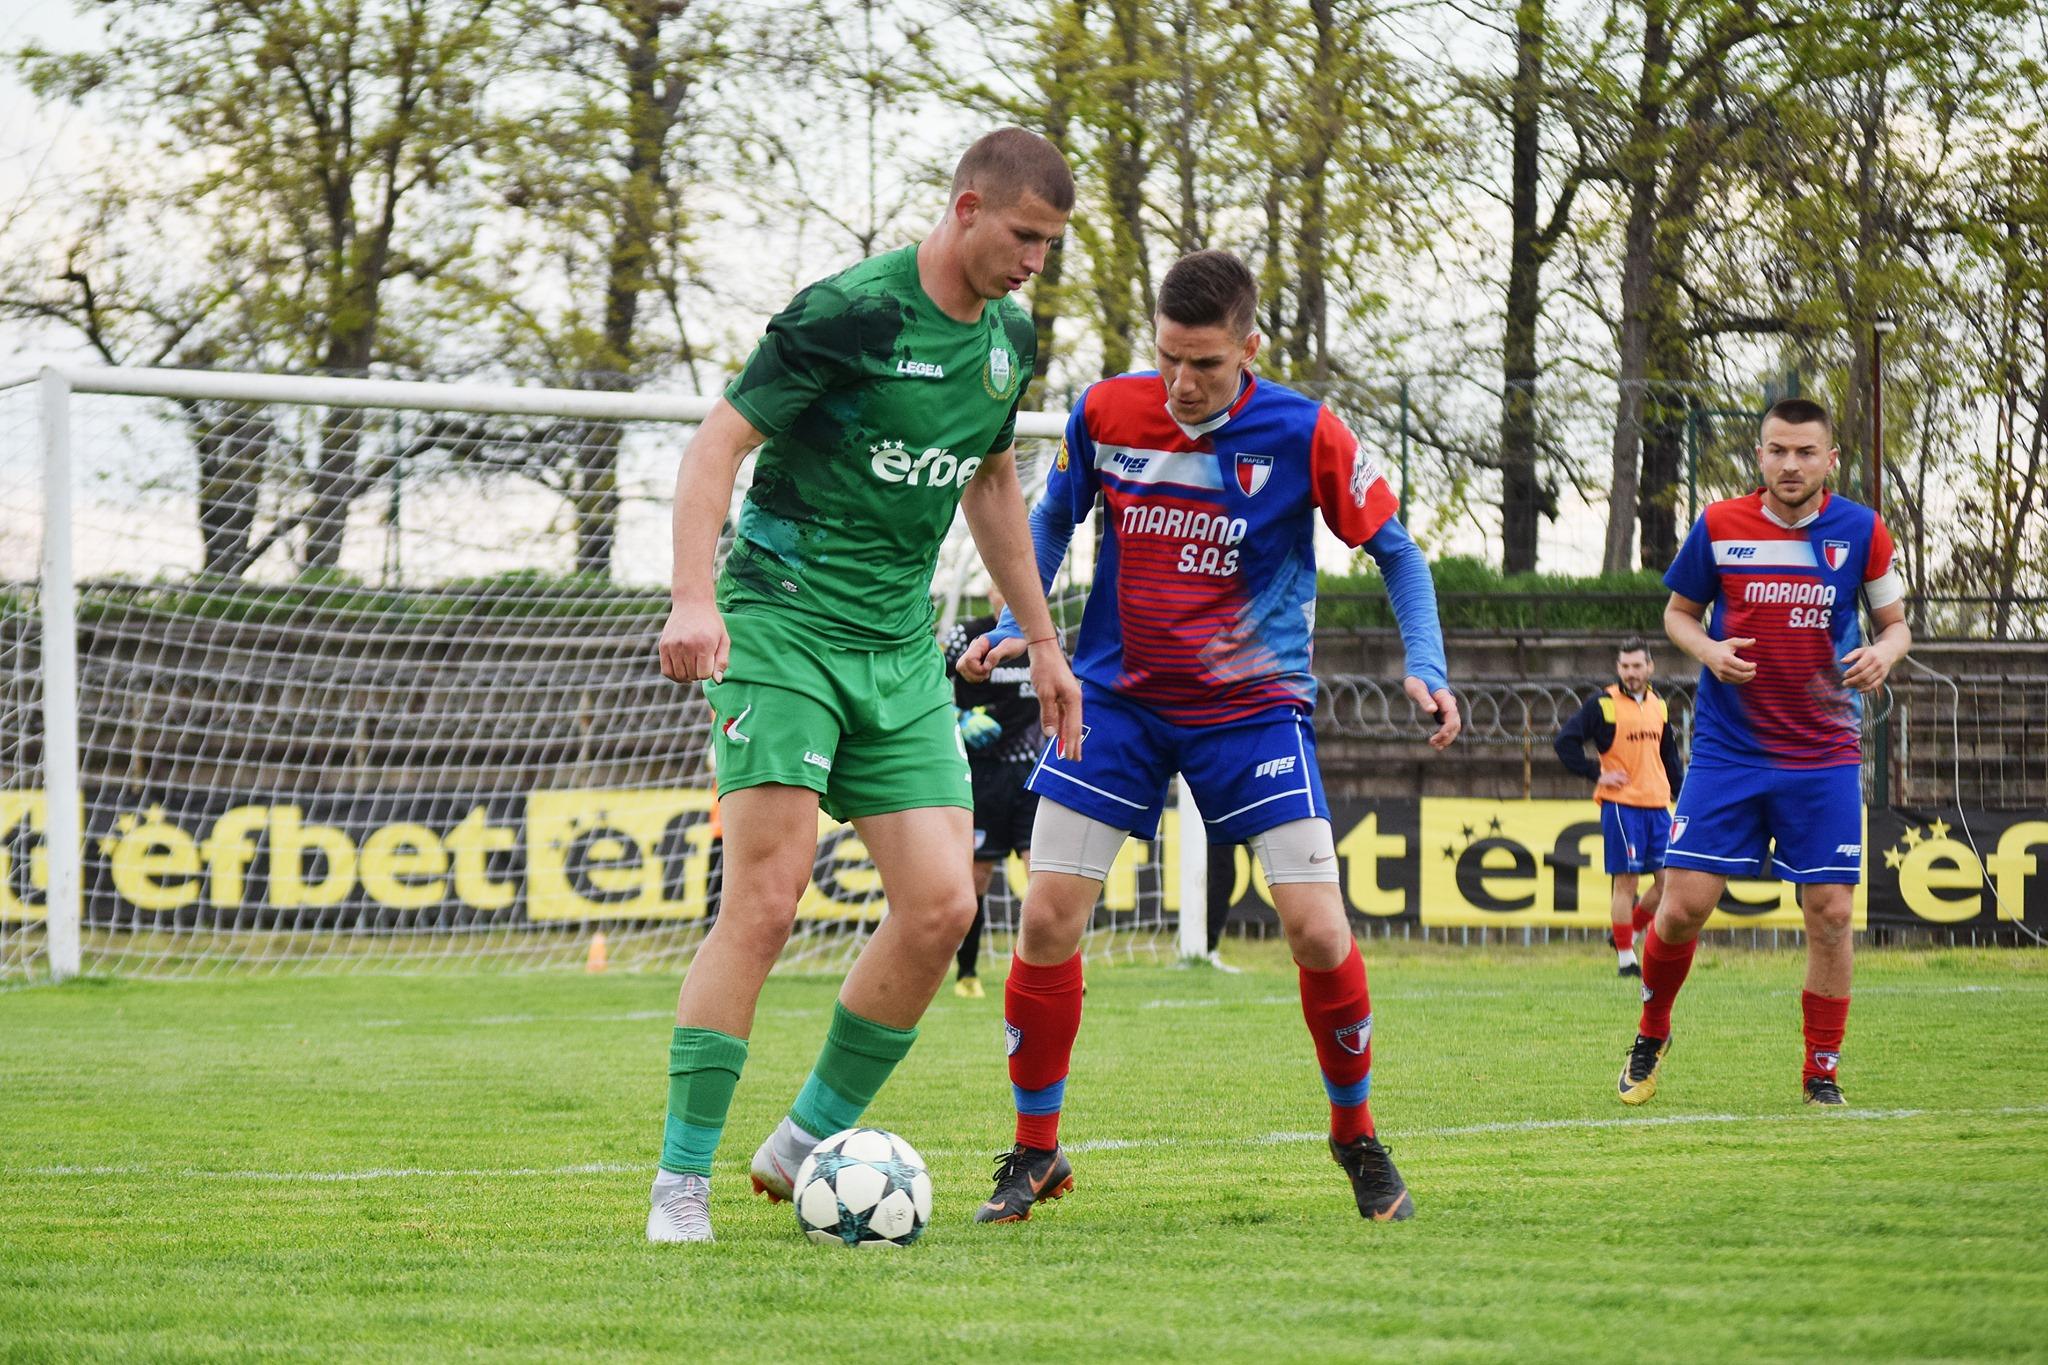 Георги Недялков вкара два гола в мача.